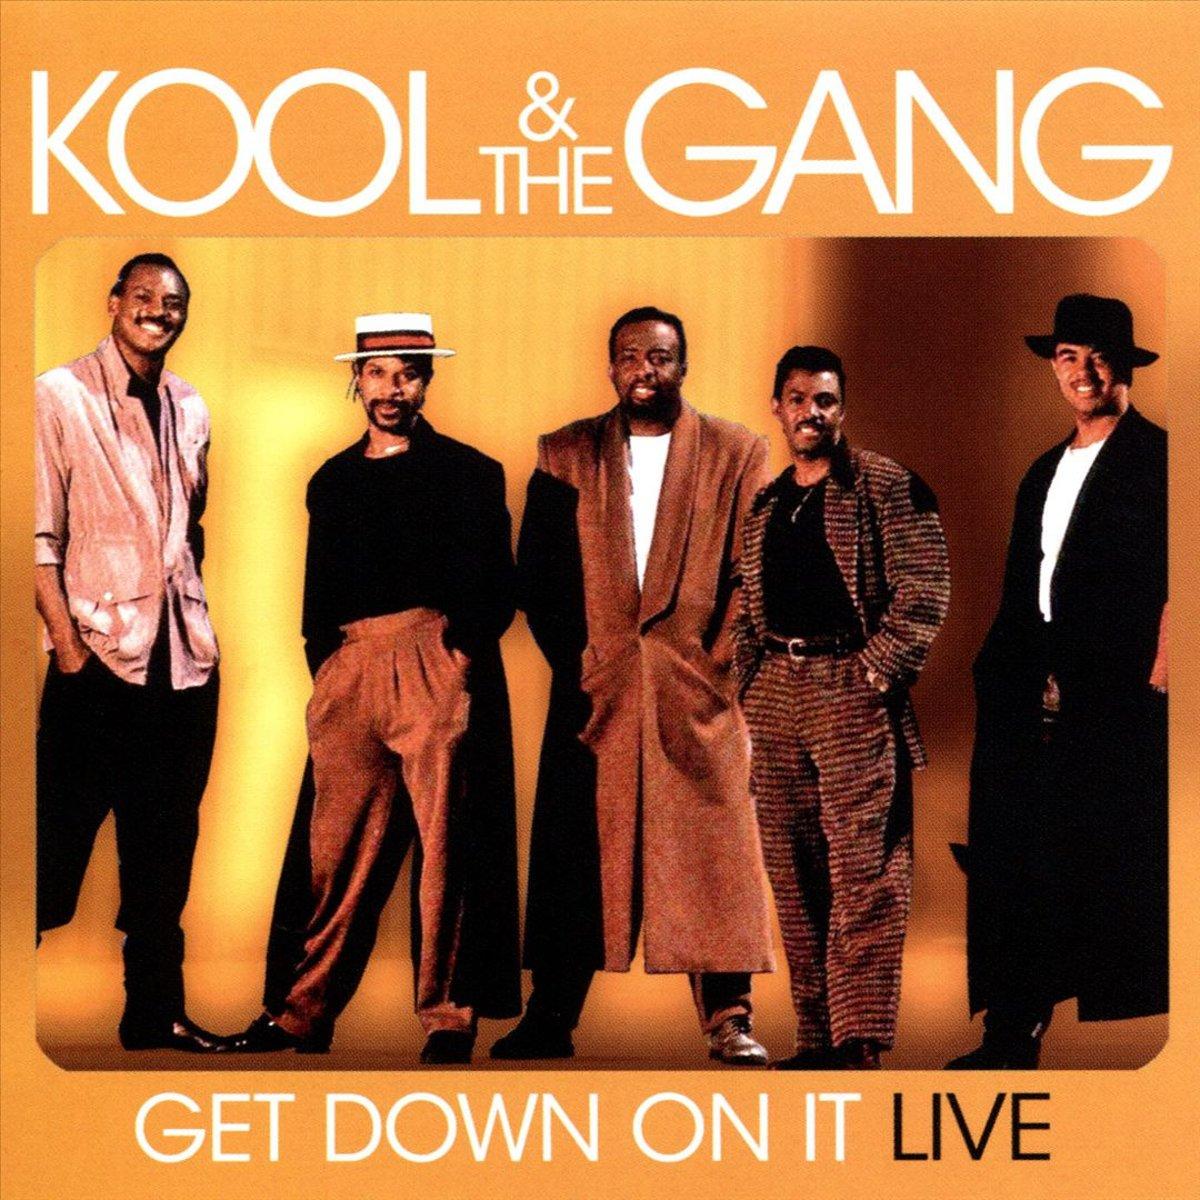 Kool & The Gang Kool & The Gang. Live the magic gang the magic gang the magic gang